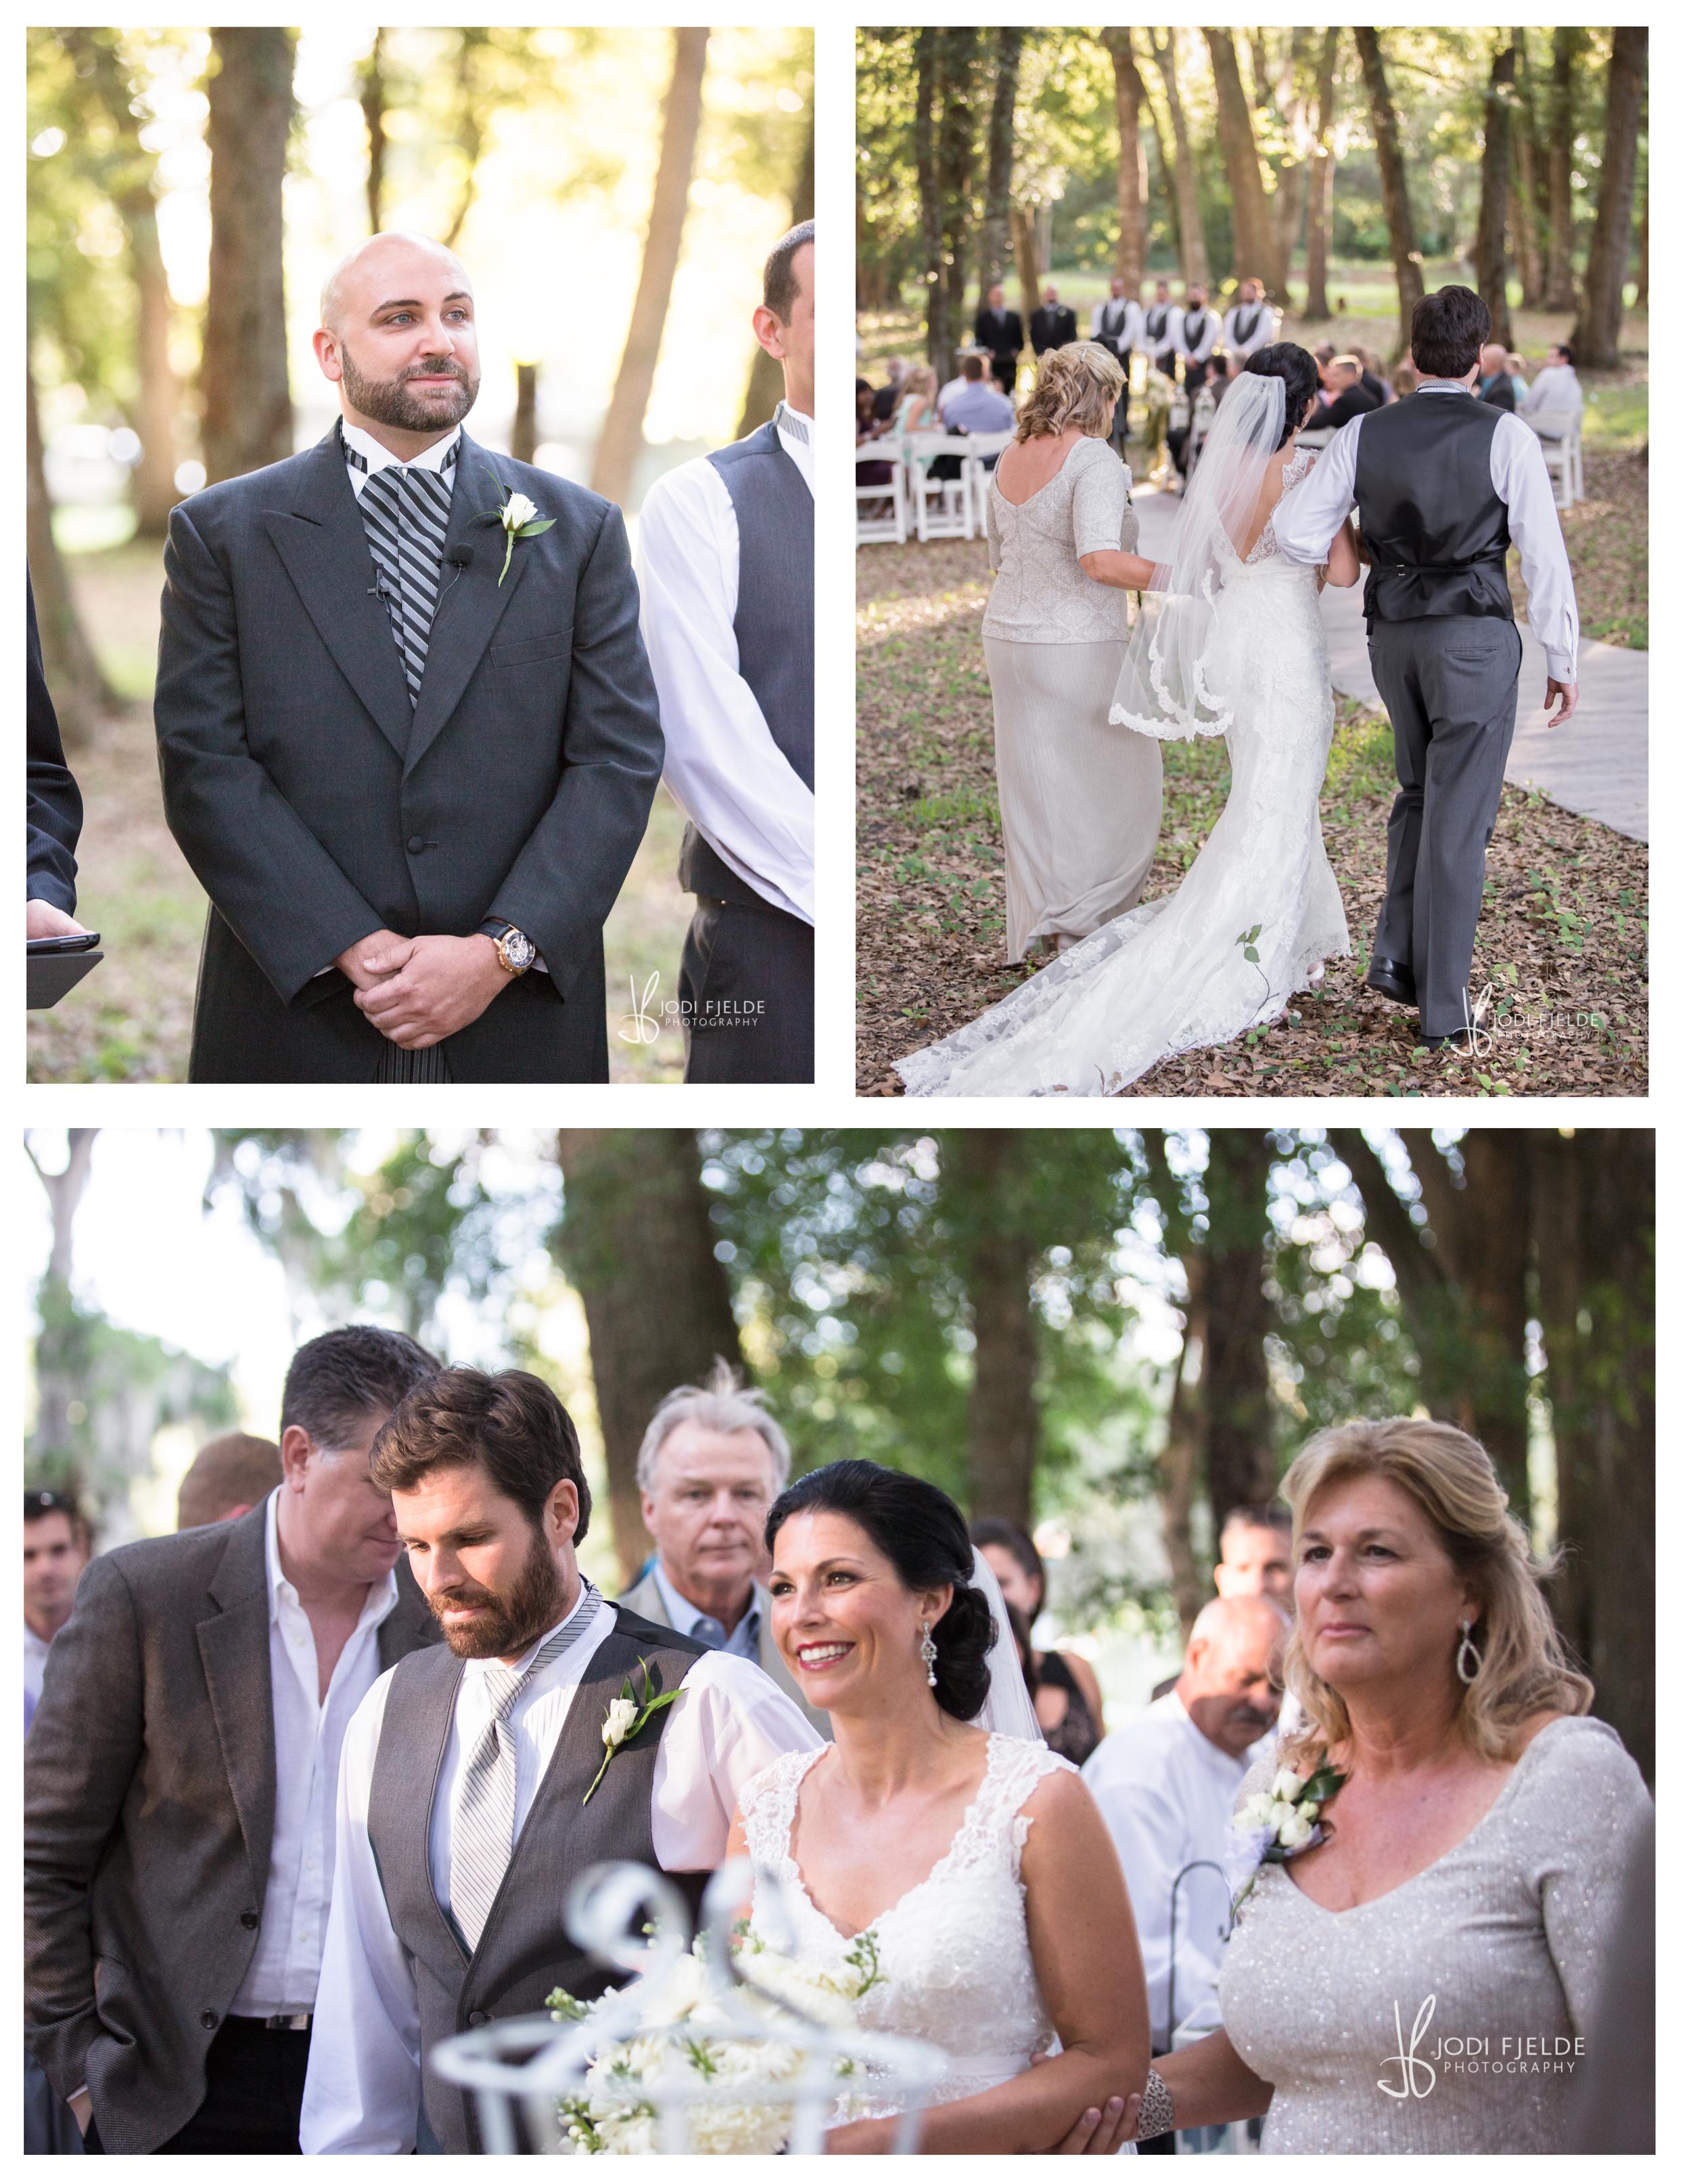 Highland_Manor_Apopka_Florida_wedding_Jackie_&_Tim_photography_jodi_Fjelde_photography-13.jpg